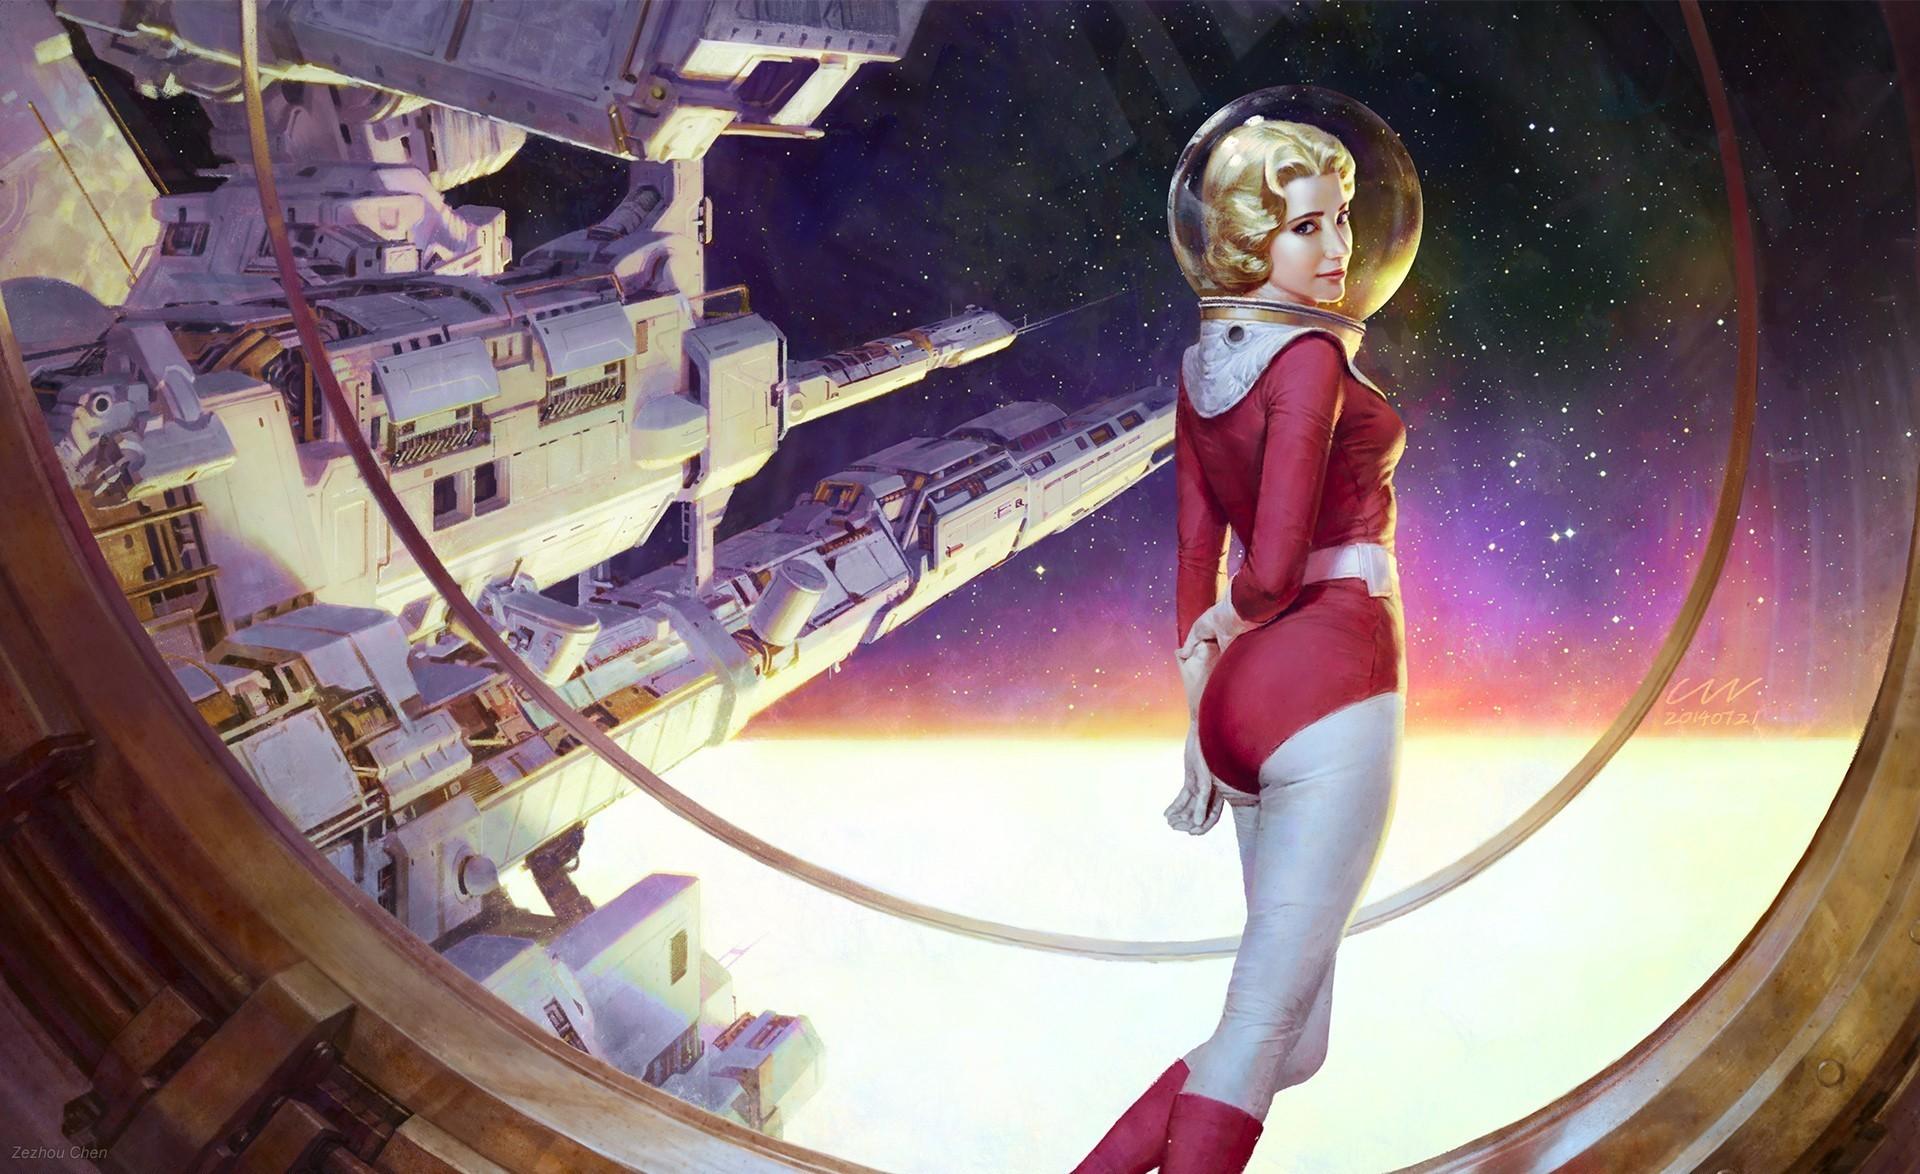 General 1920x1174 science fiction astronaut artwork retro science fiction space women